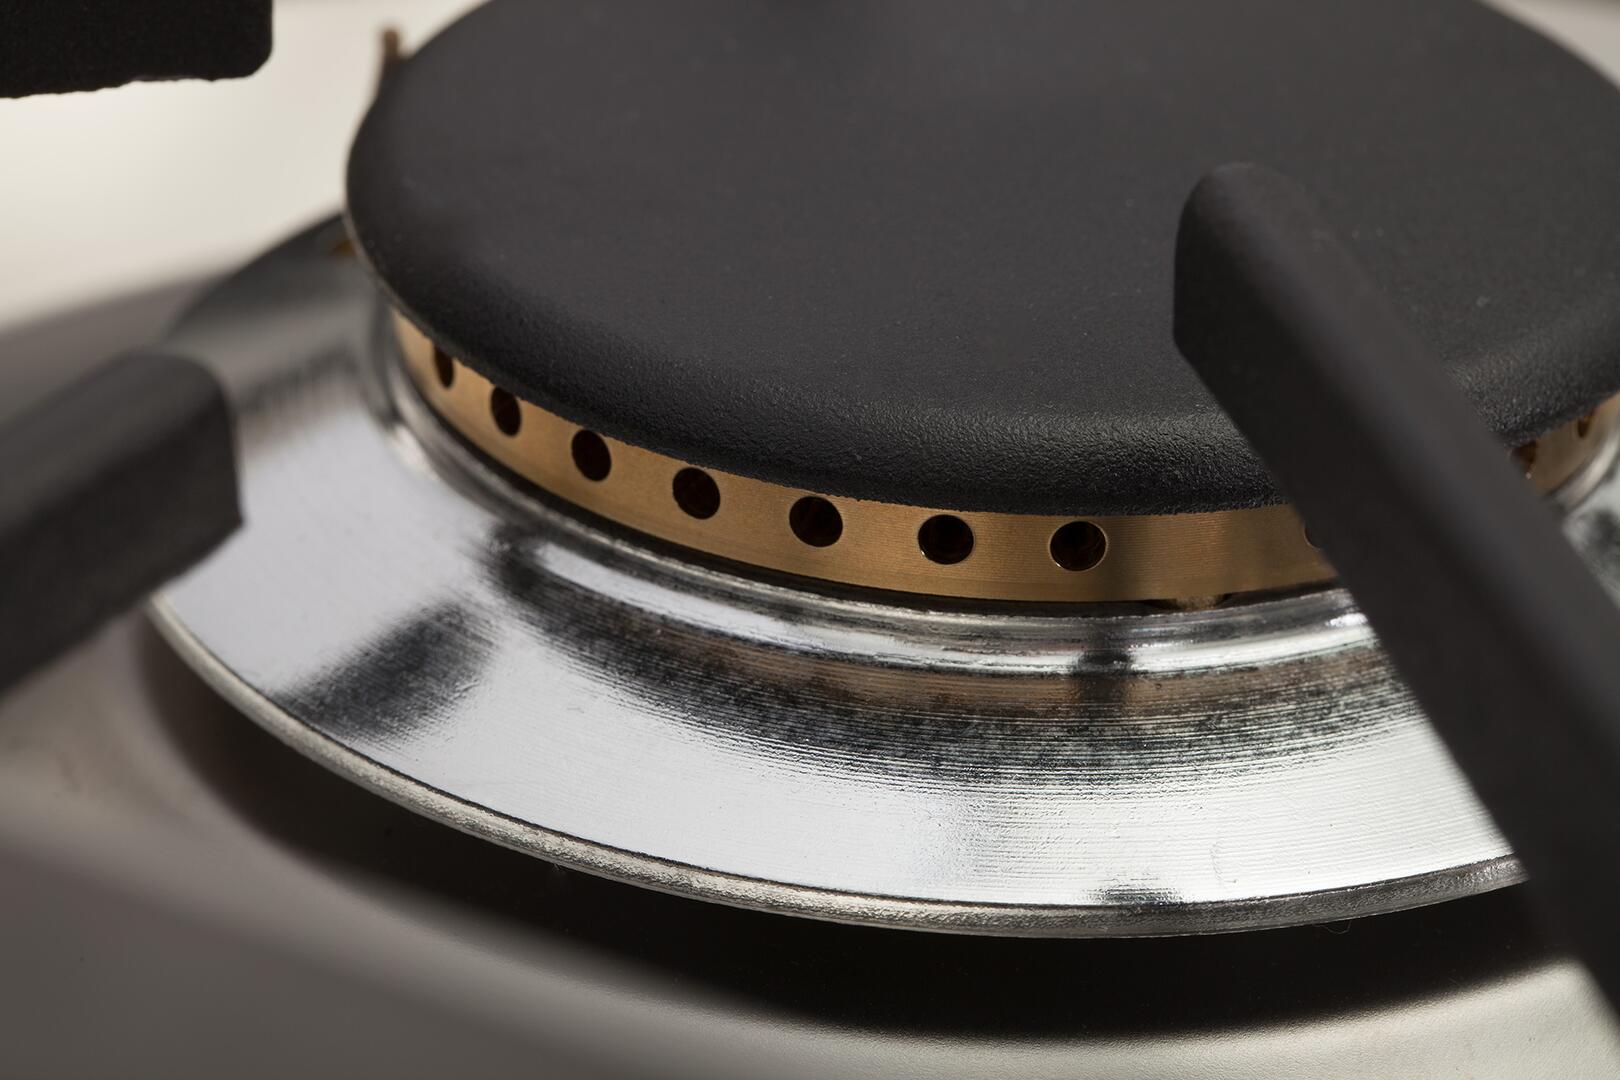 Ilve Professional Plus UPW90FDMPM Freestanding Dual Fuel Range Graphite, 4